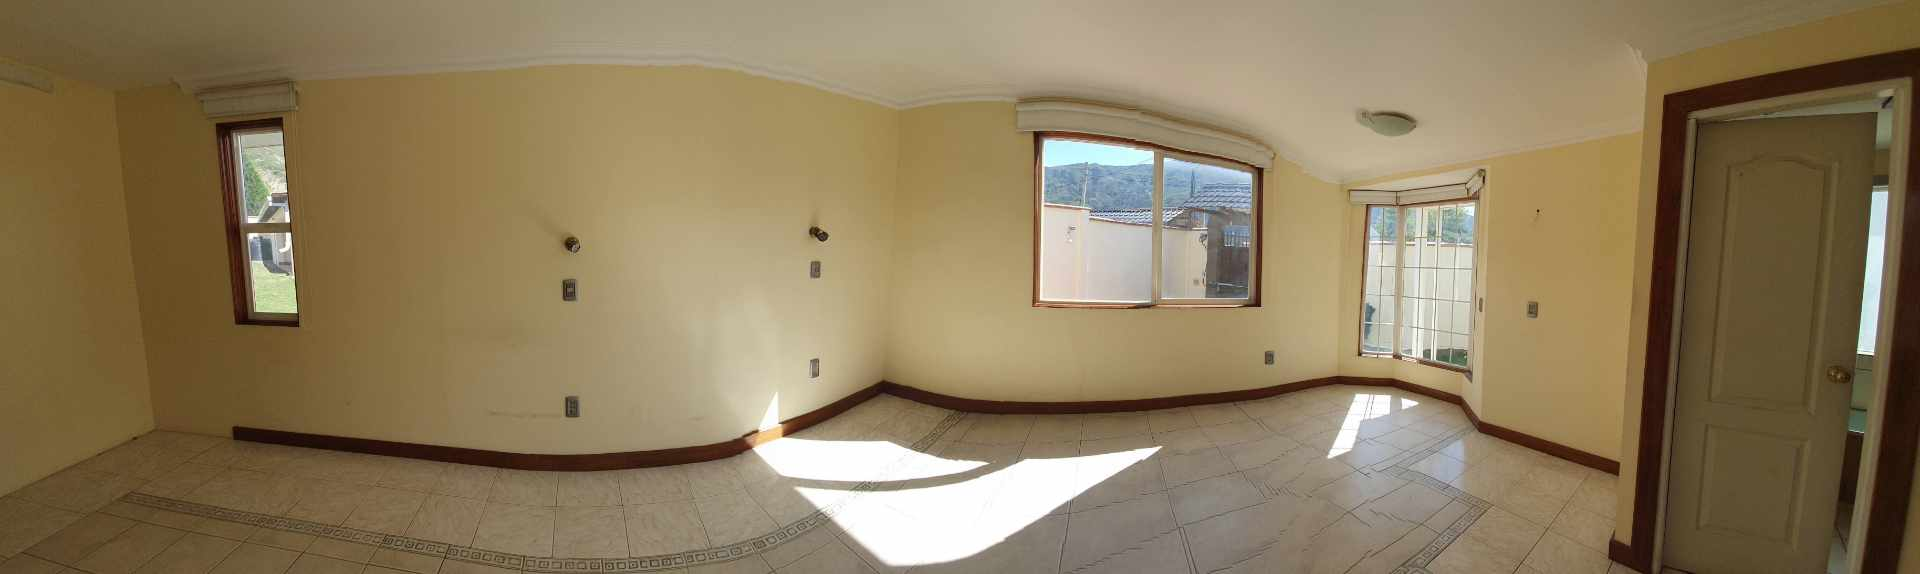 Casa en Venta Zona Sur, Huajchilla. Urbanizacion Bartos. Foto 12